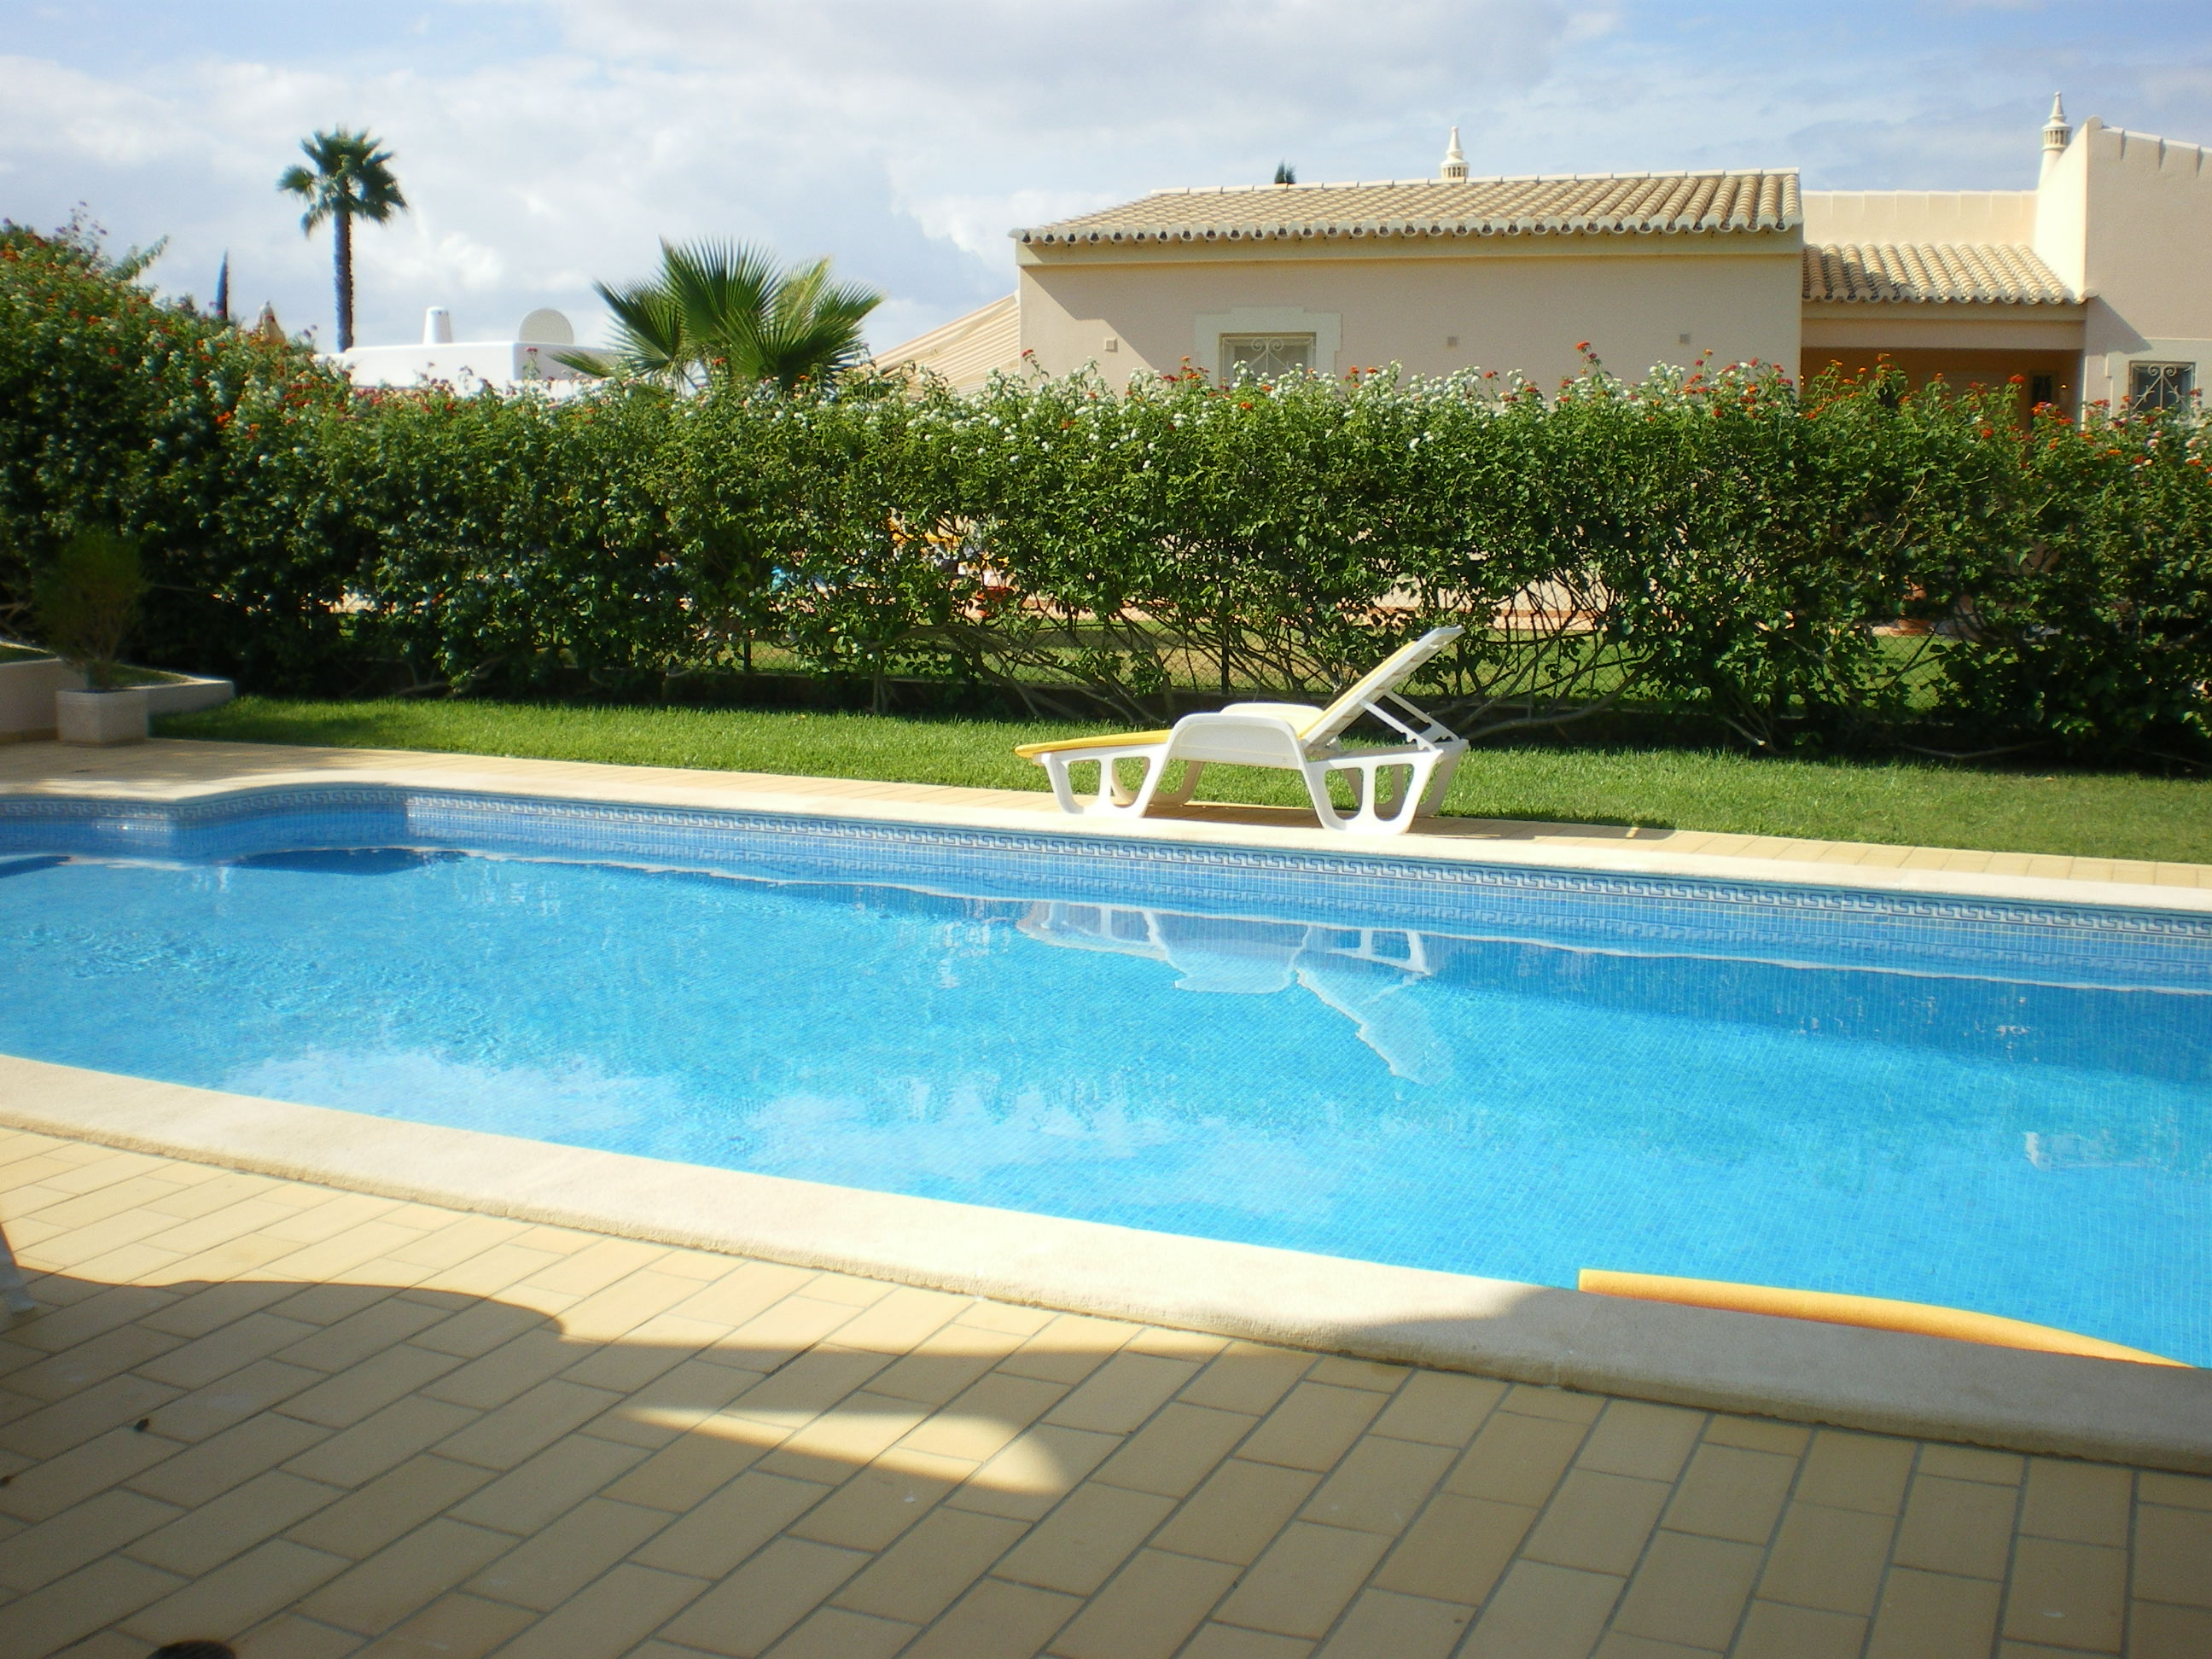 Holiday apartments and villas for rent, Maison avec piscine en Algarve au sud du Portugal in Lagoa, Portugal Algarve, REF_IMG_7550_8892